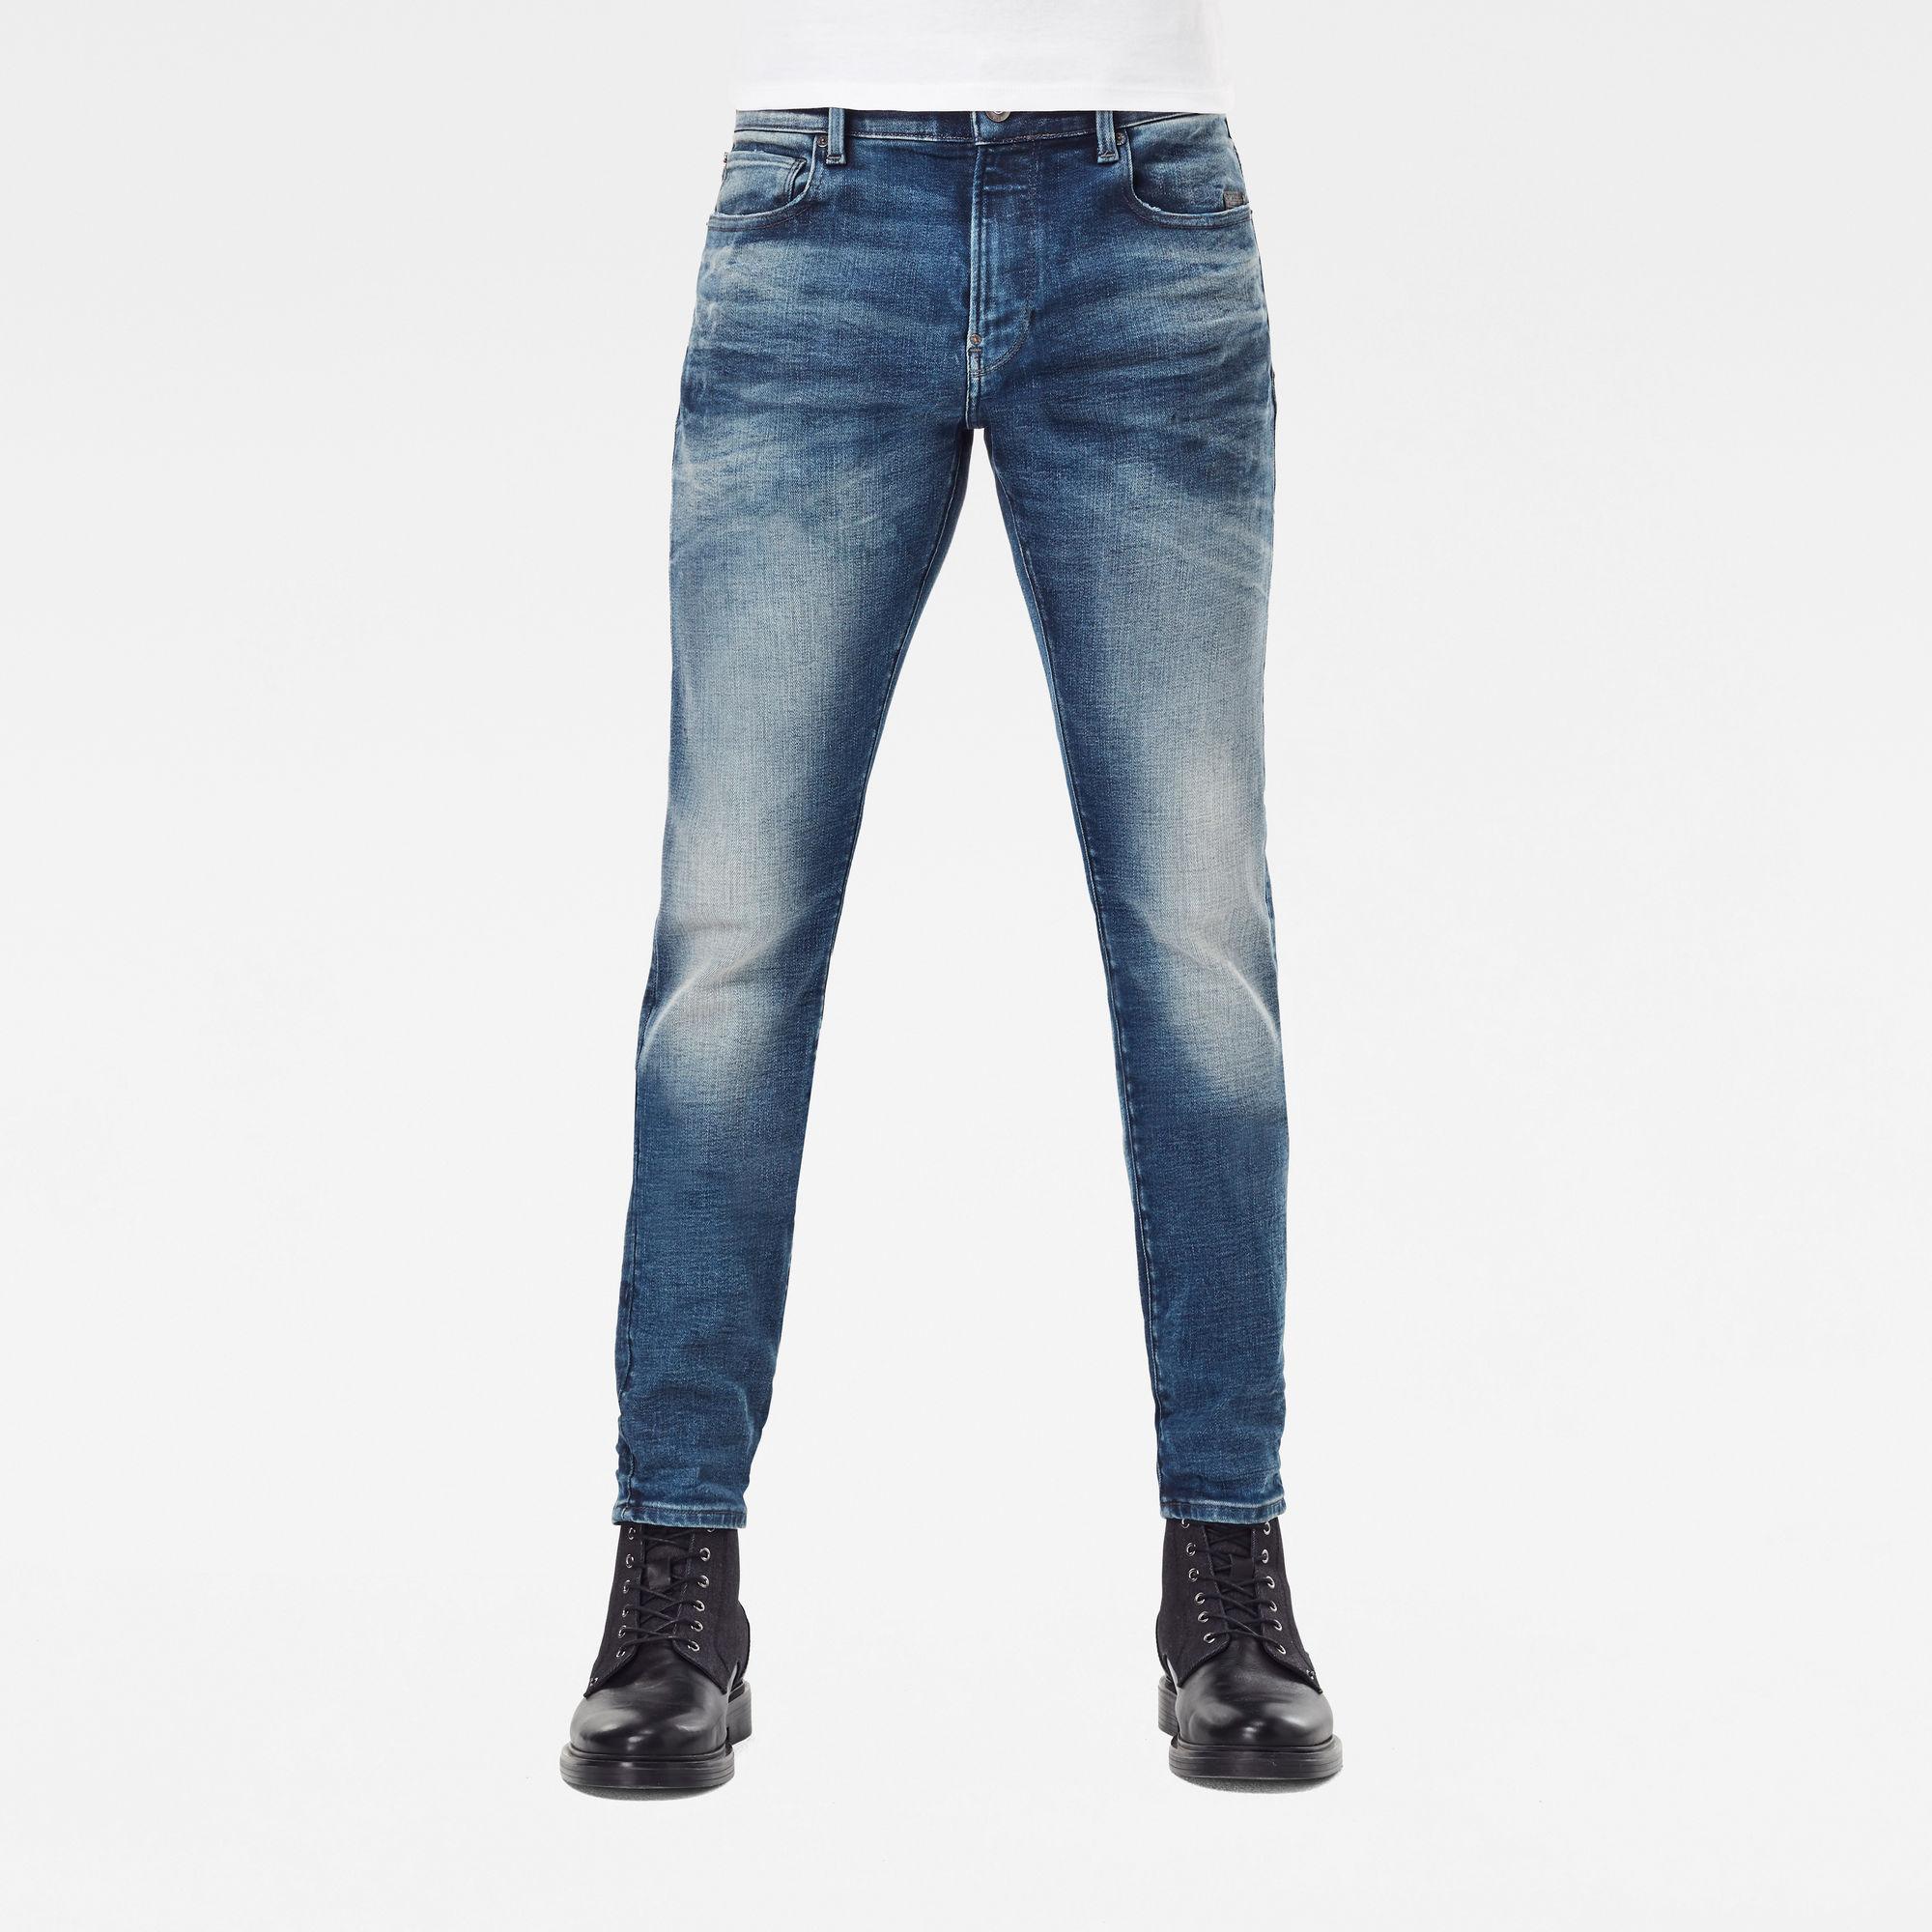 G-Star RAW Heren Revend Skinny Jeans Blauw